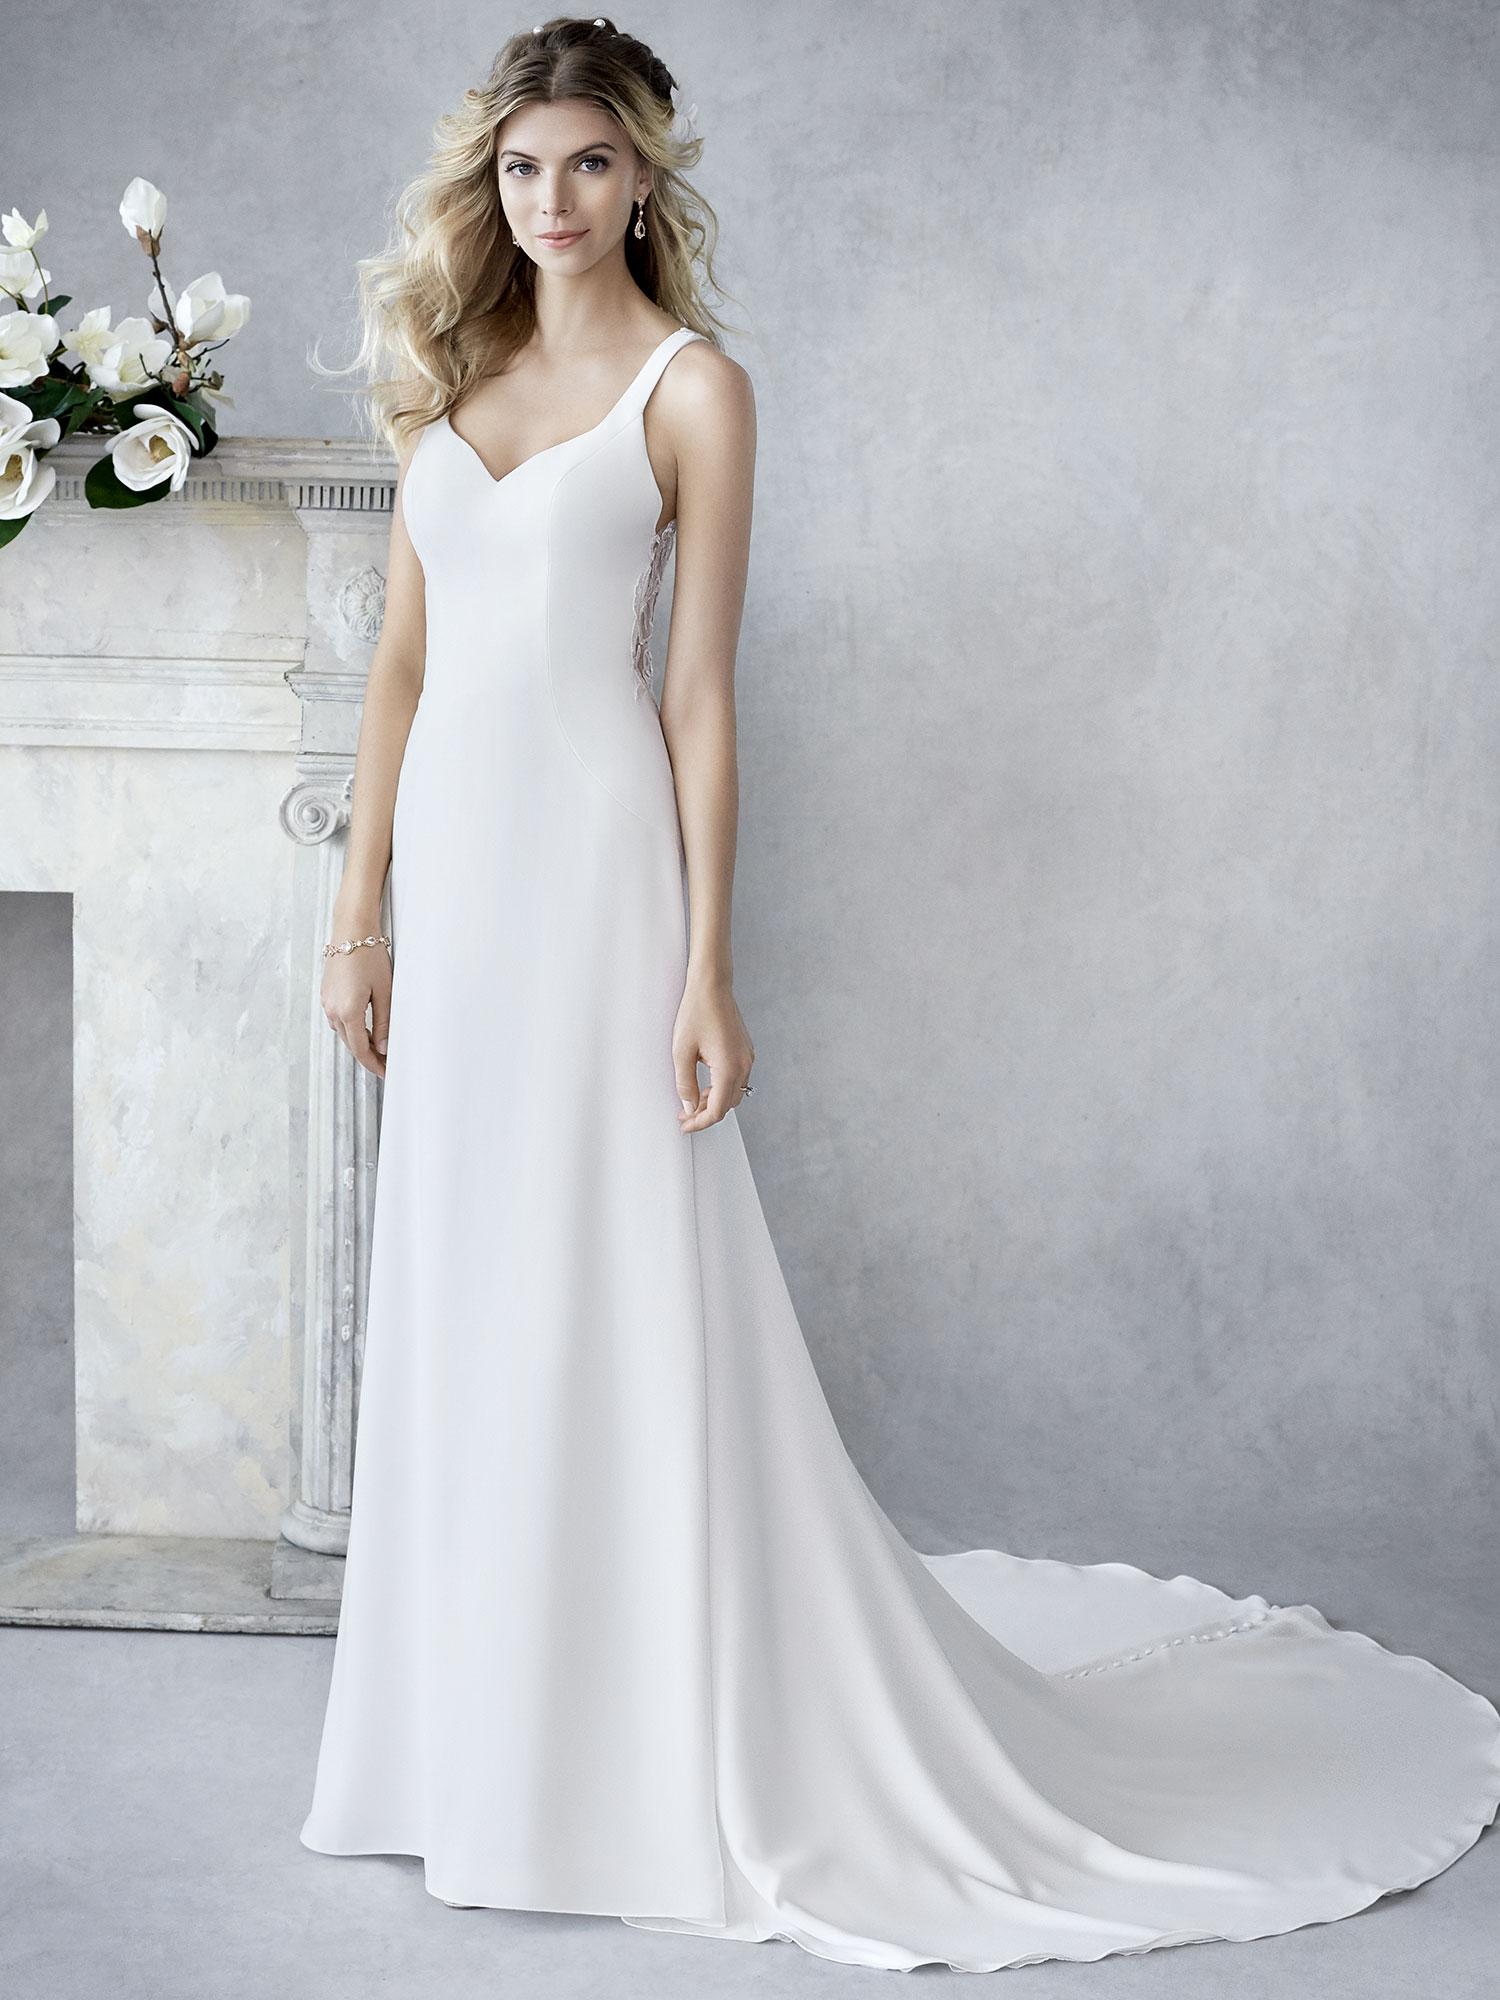 c3904fa2c9 Menyasszonyi ruha » Ella Rosa » Tiffany | Mary's Esküvői Szalonok